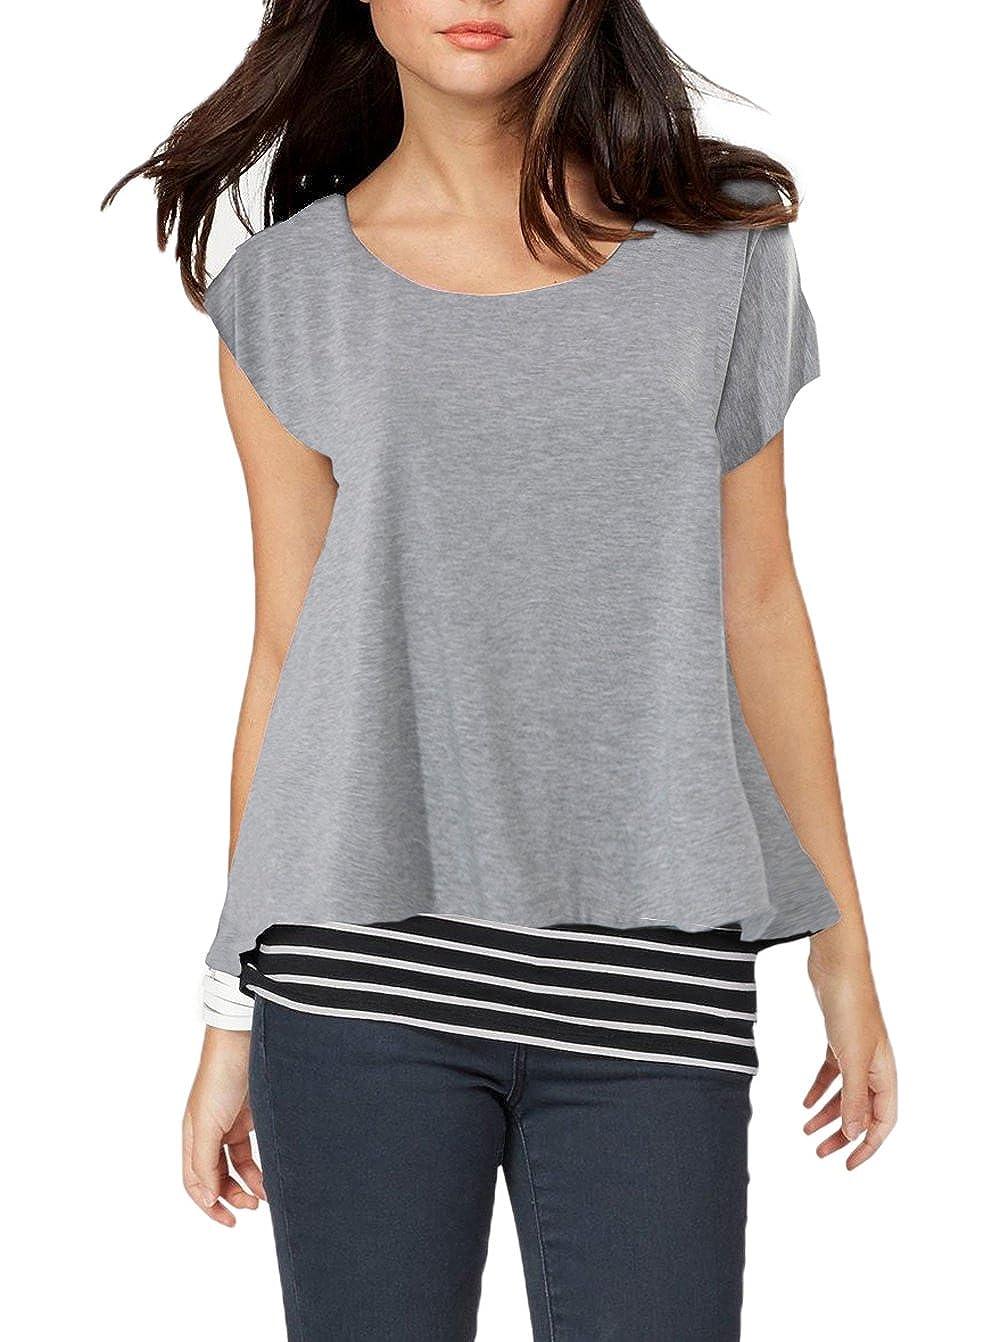 Grey Jusfitsu Women's Loose Layered Short Sleeve Striped T Shirt Tops Casual Blouses